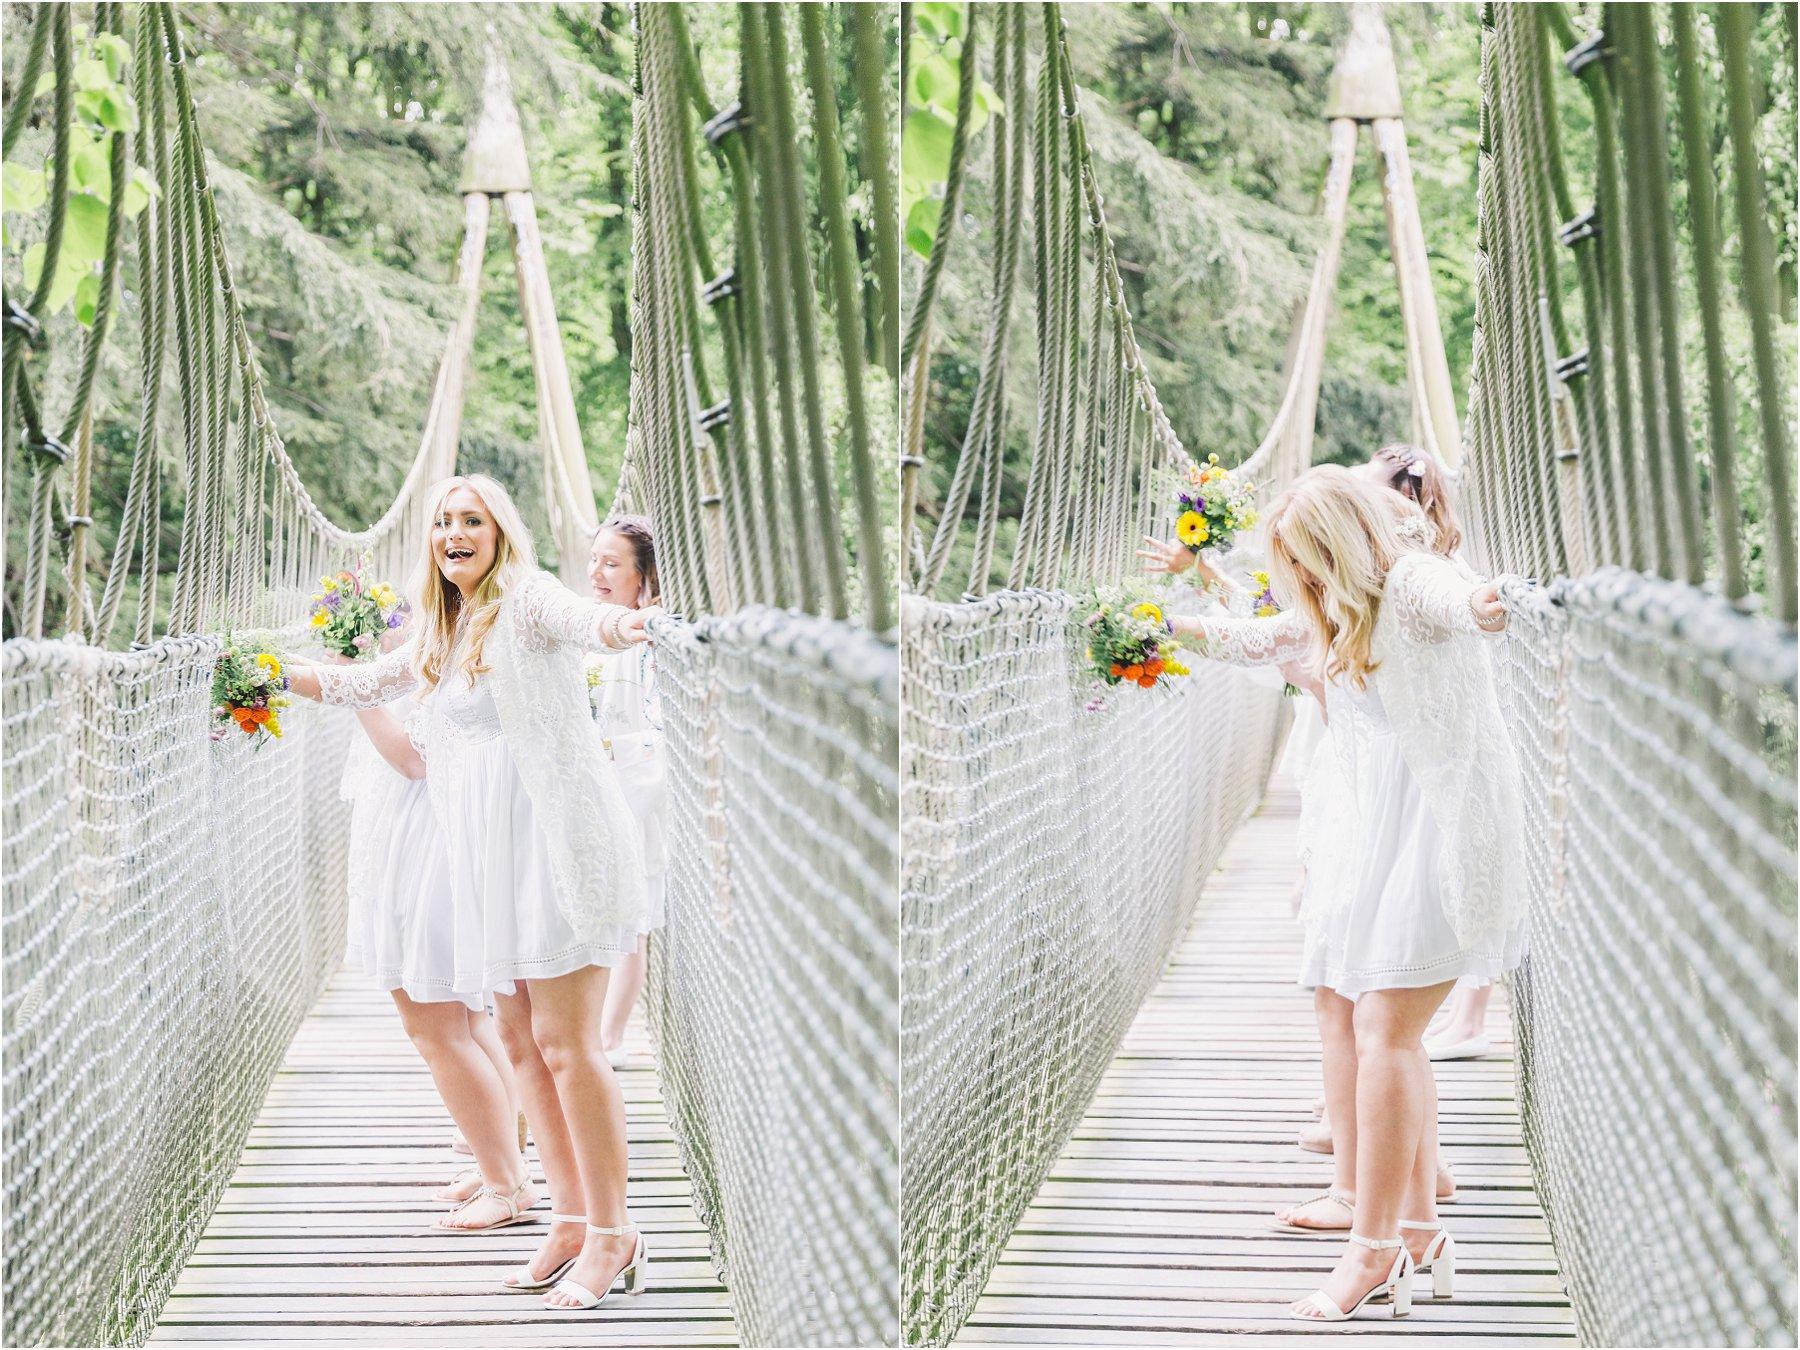 eve.photography.relaxed.creative.wedding.destination._0296.jpg